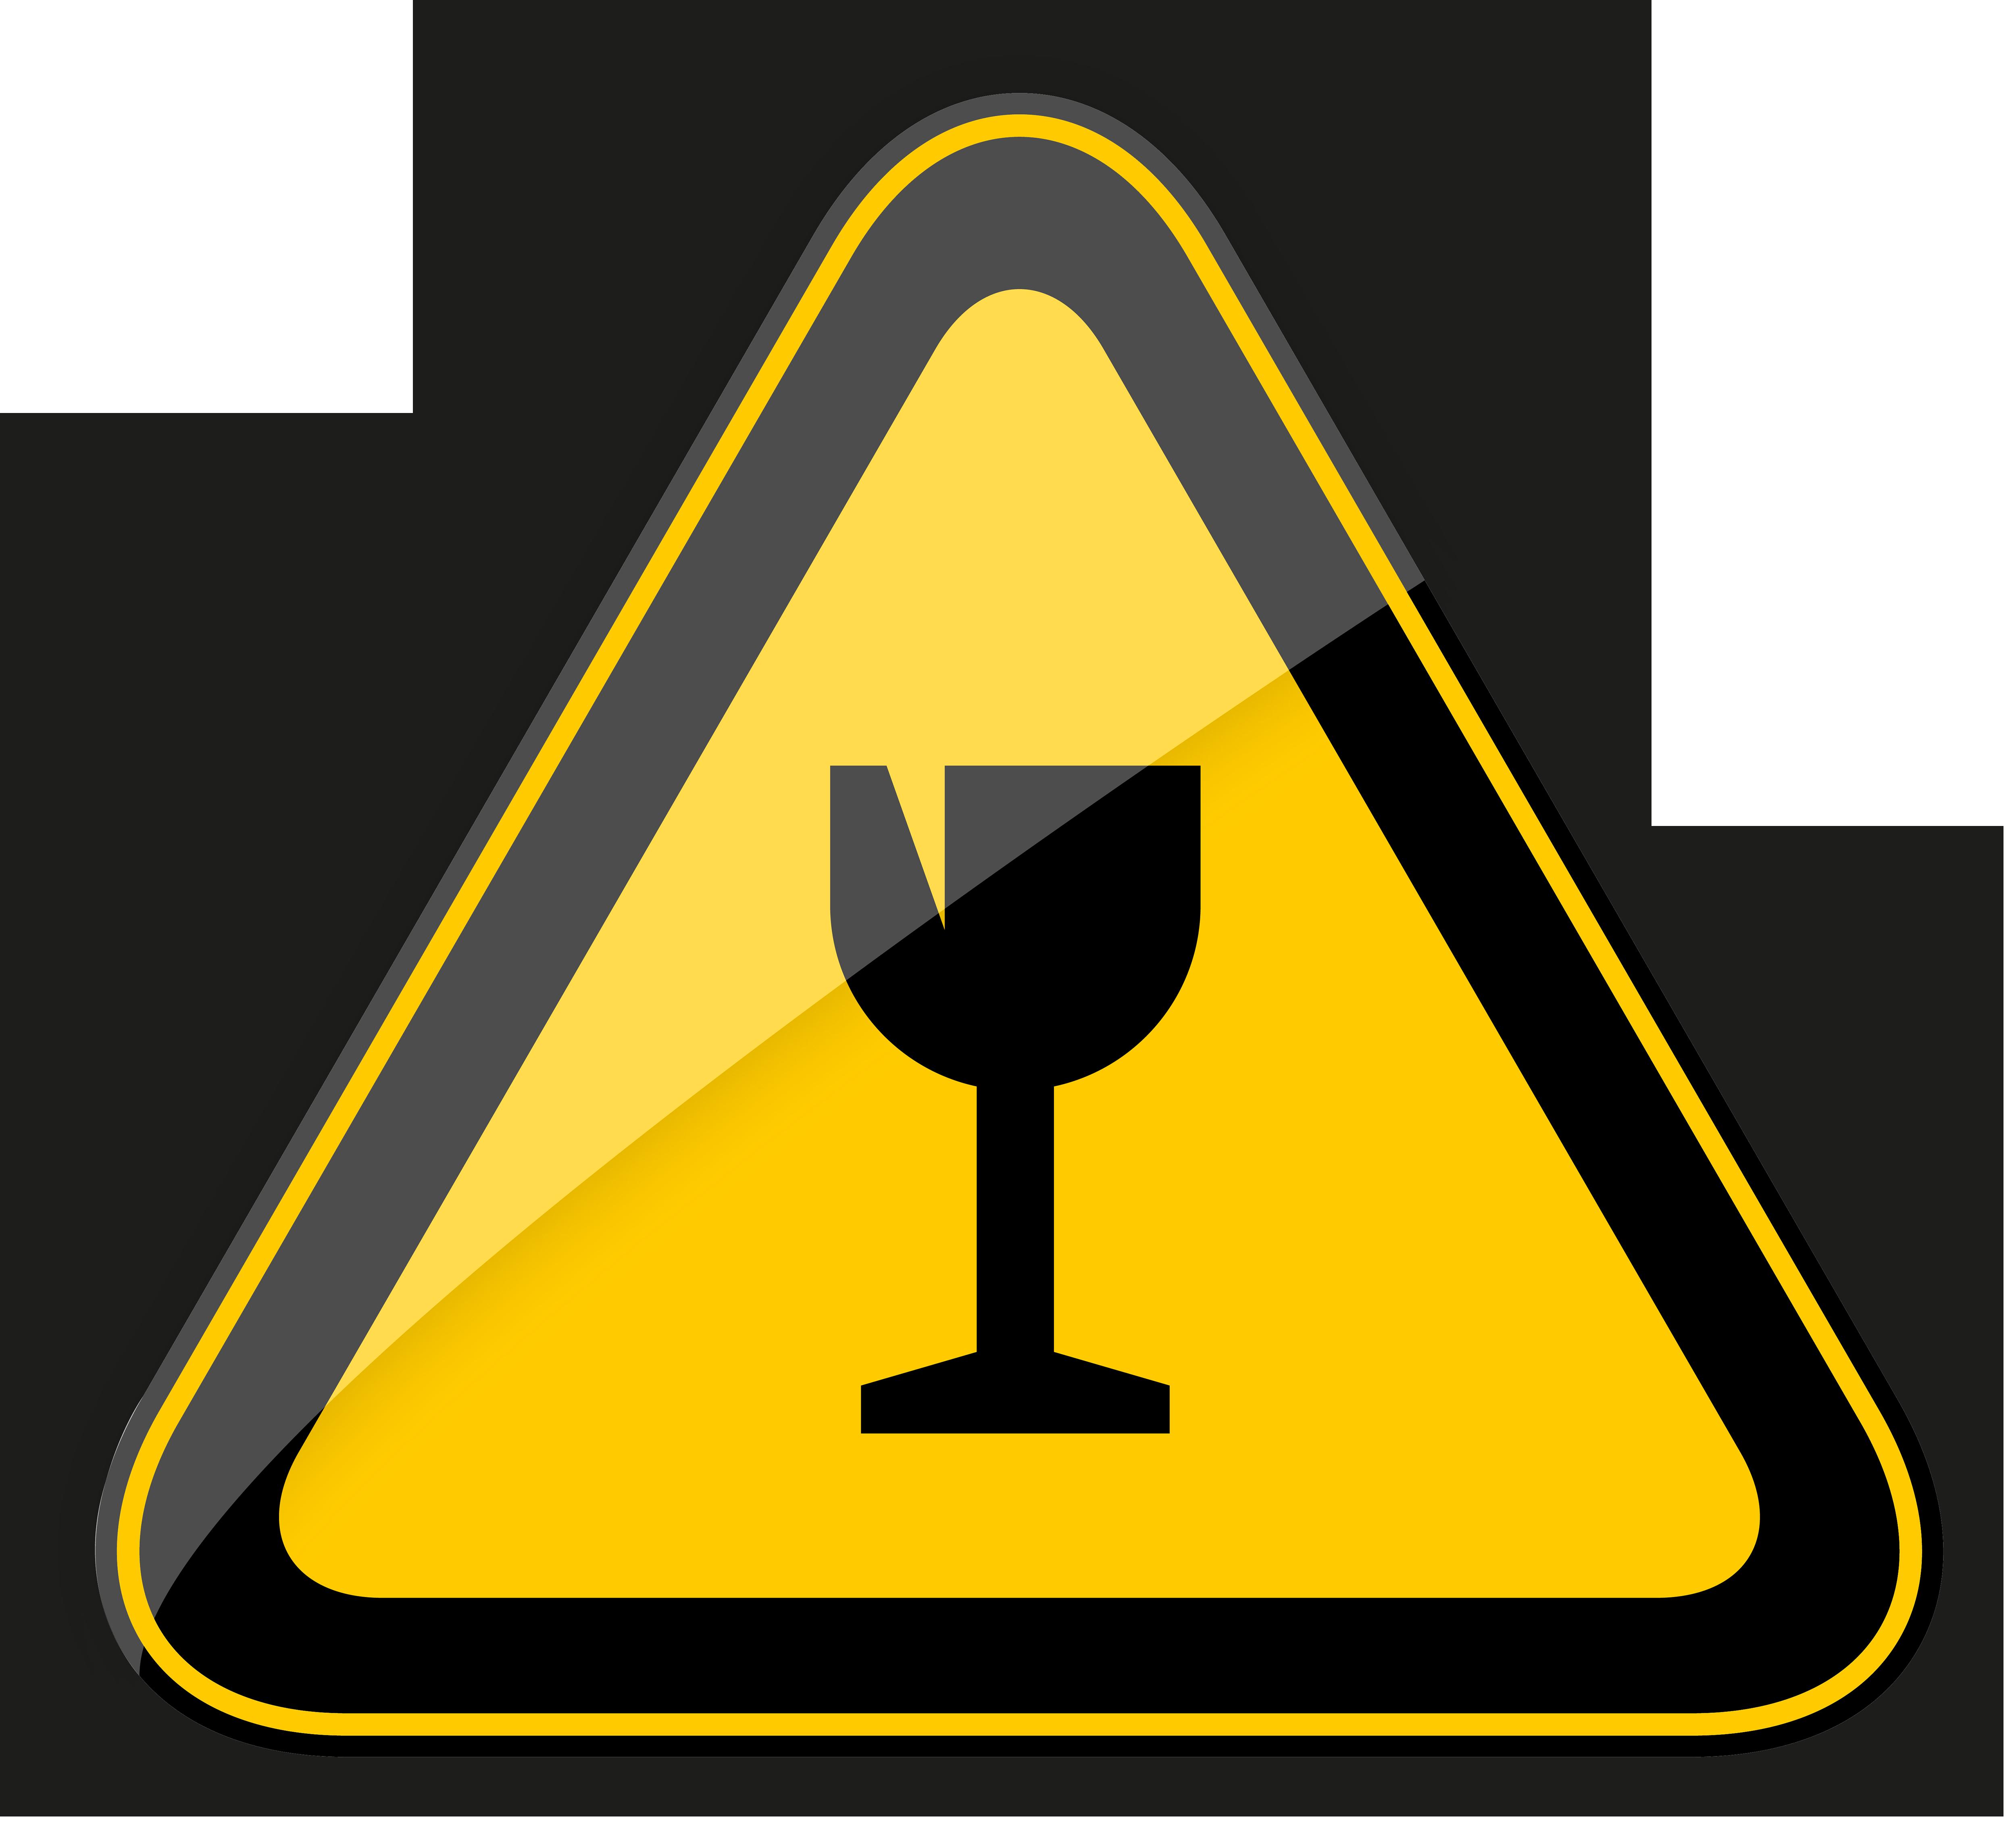 caution clipart warning light